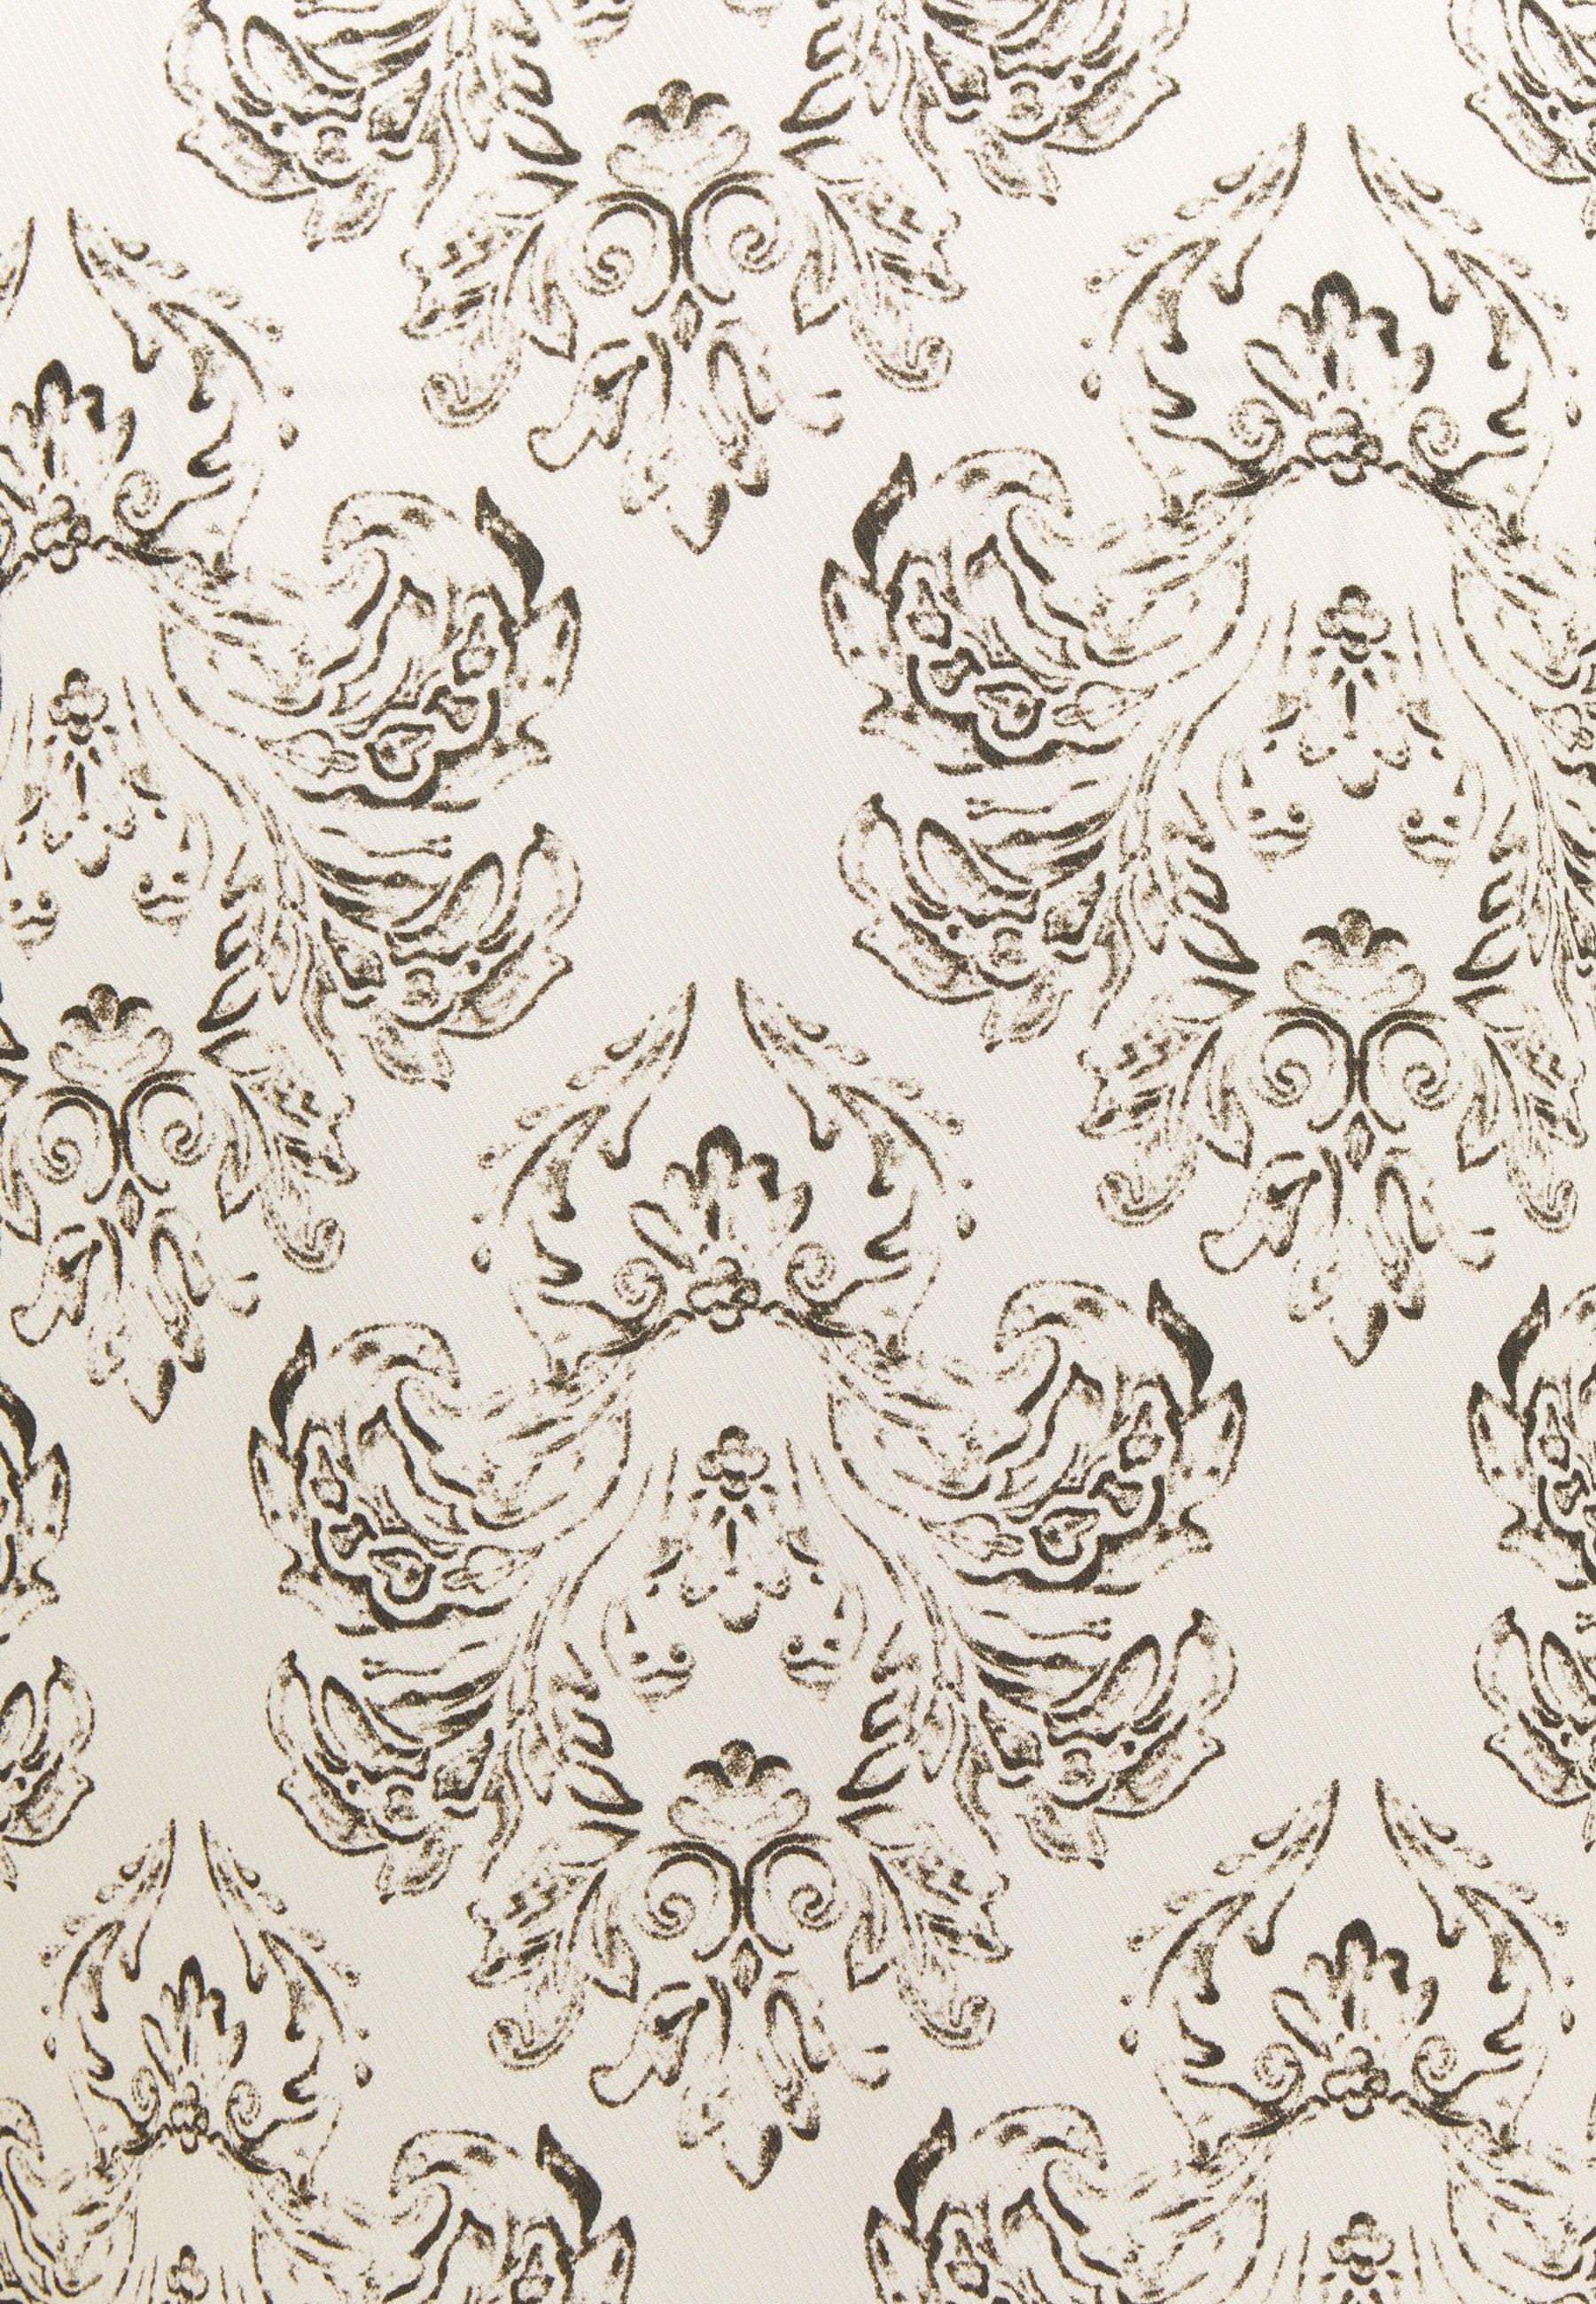 Mother of Pearl VNECK DRESS WITH DRAPE SLEEVE TASSELS Freizeitkleid ivory/beige